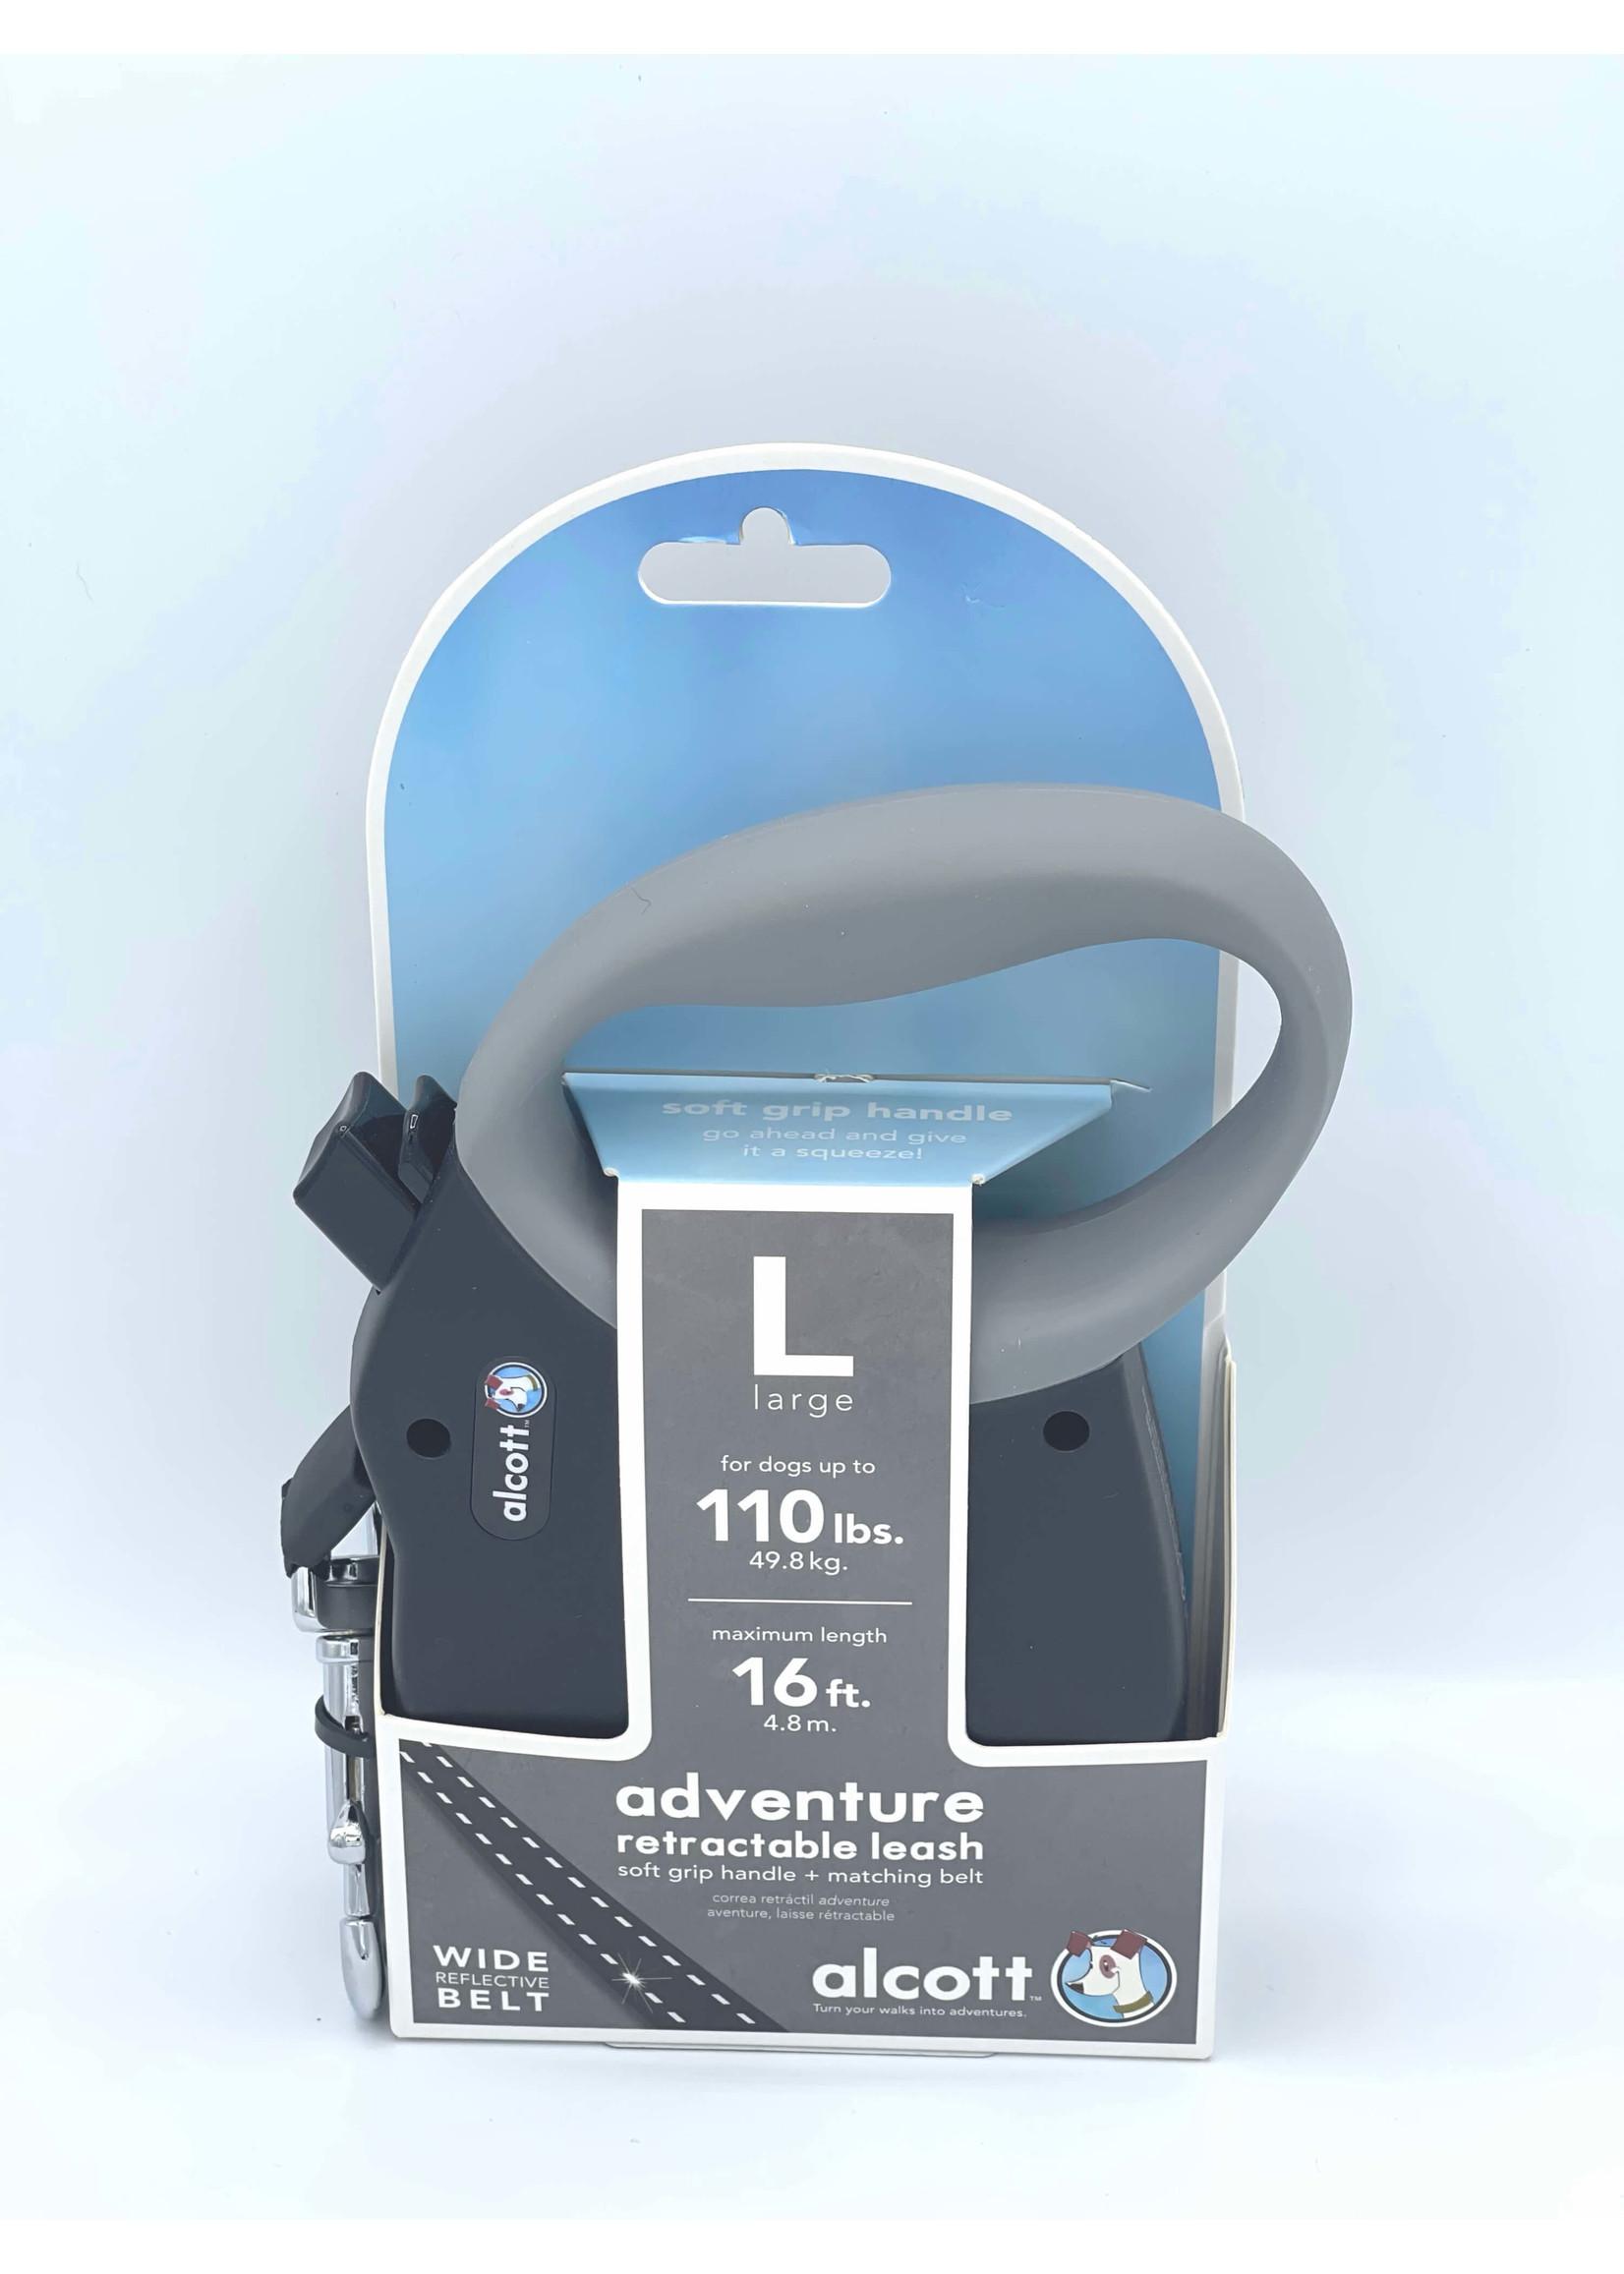 Alcott Alcott™ Adventure Retractable Leash Black Large Up to 110 lbs